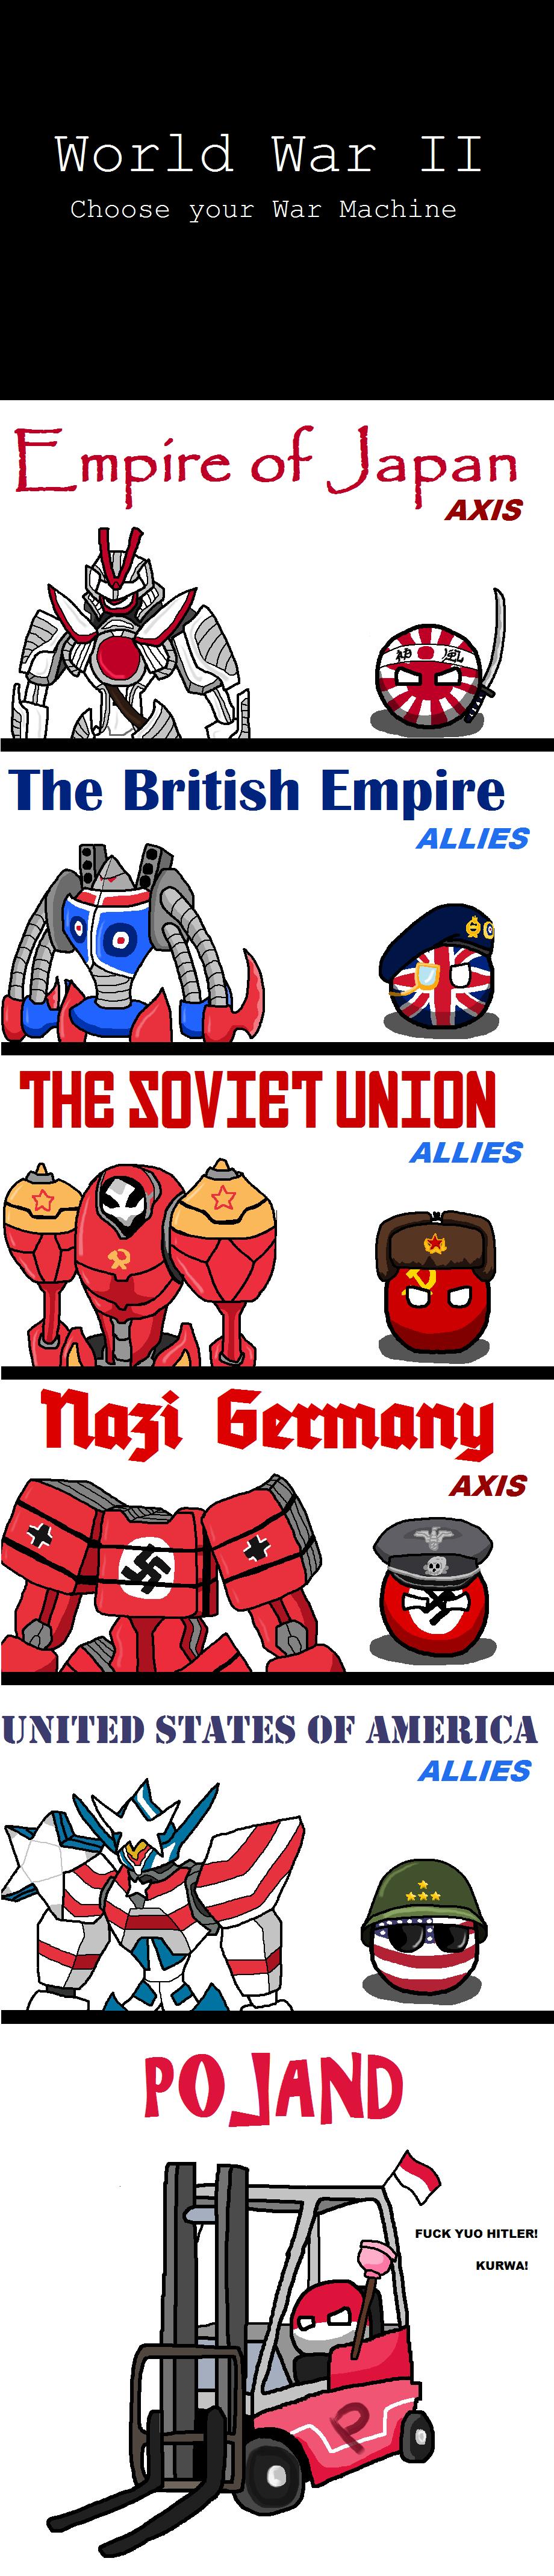 Machine clipart pokland UK Poland Soviet War War